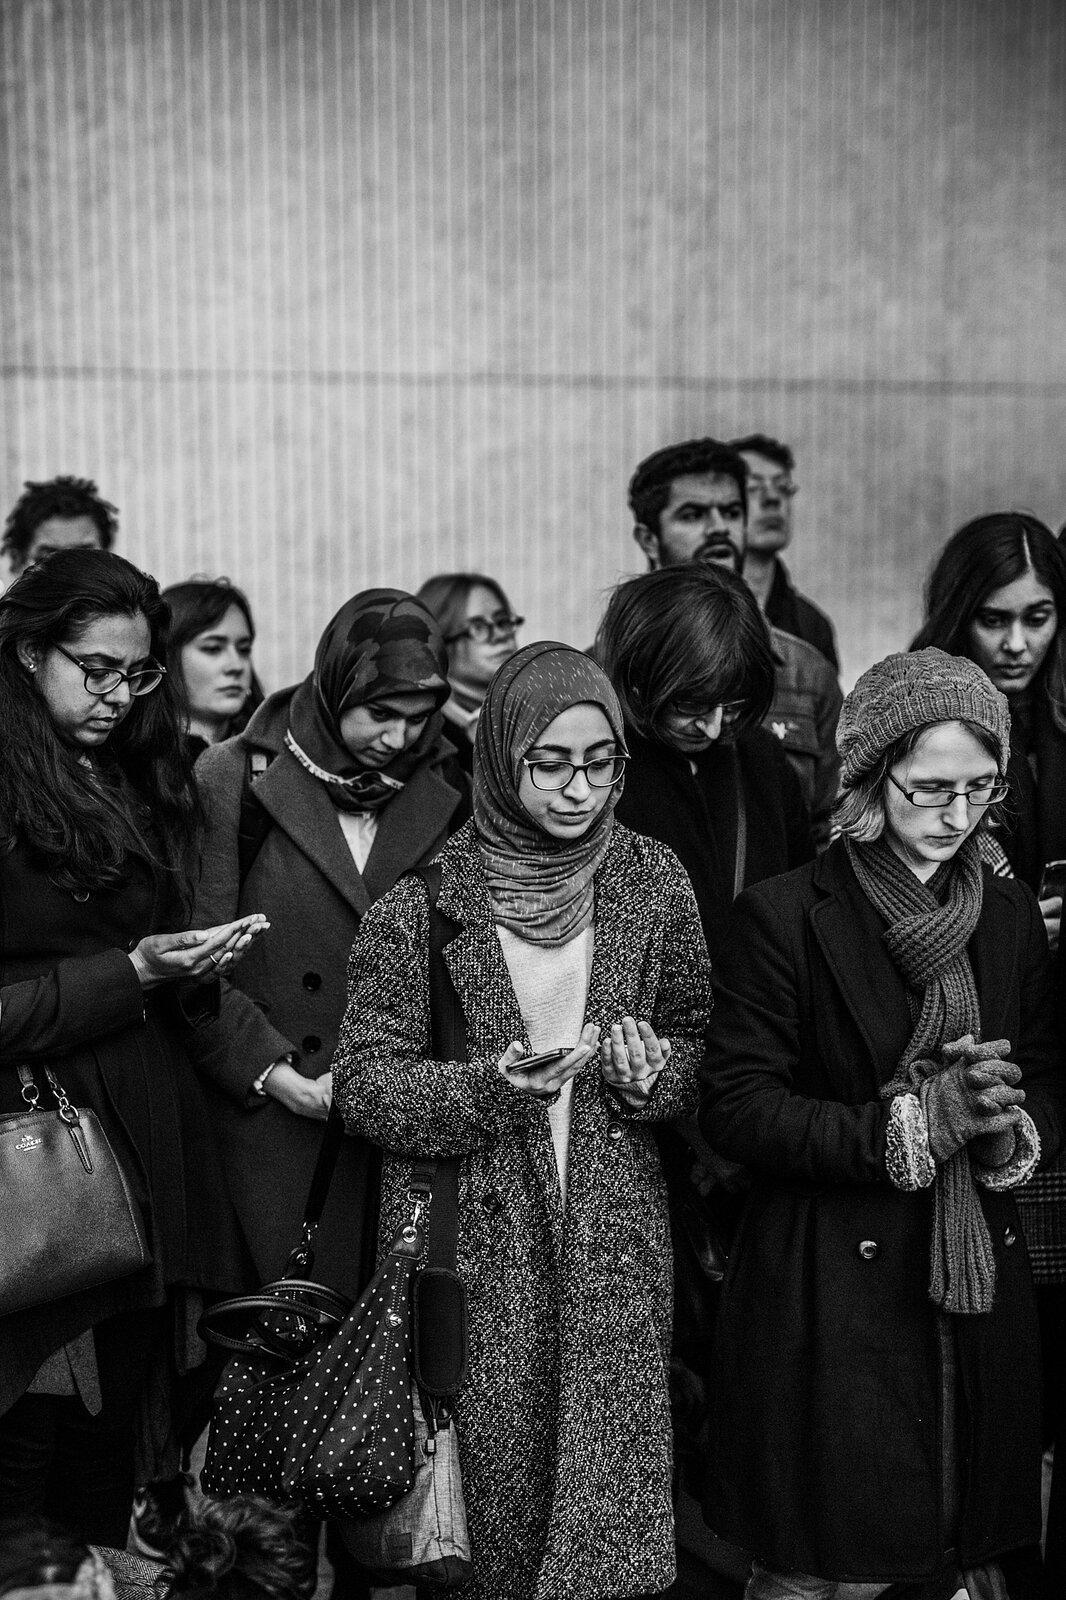 Christchurch Vigil